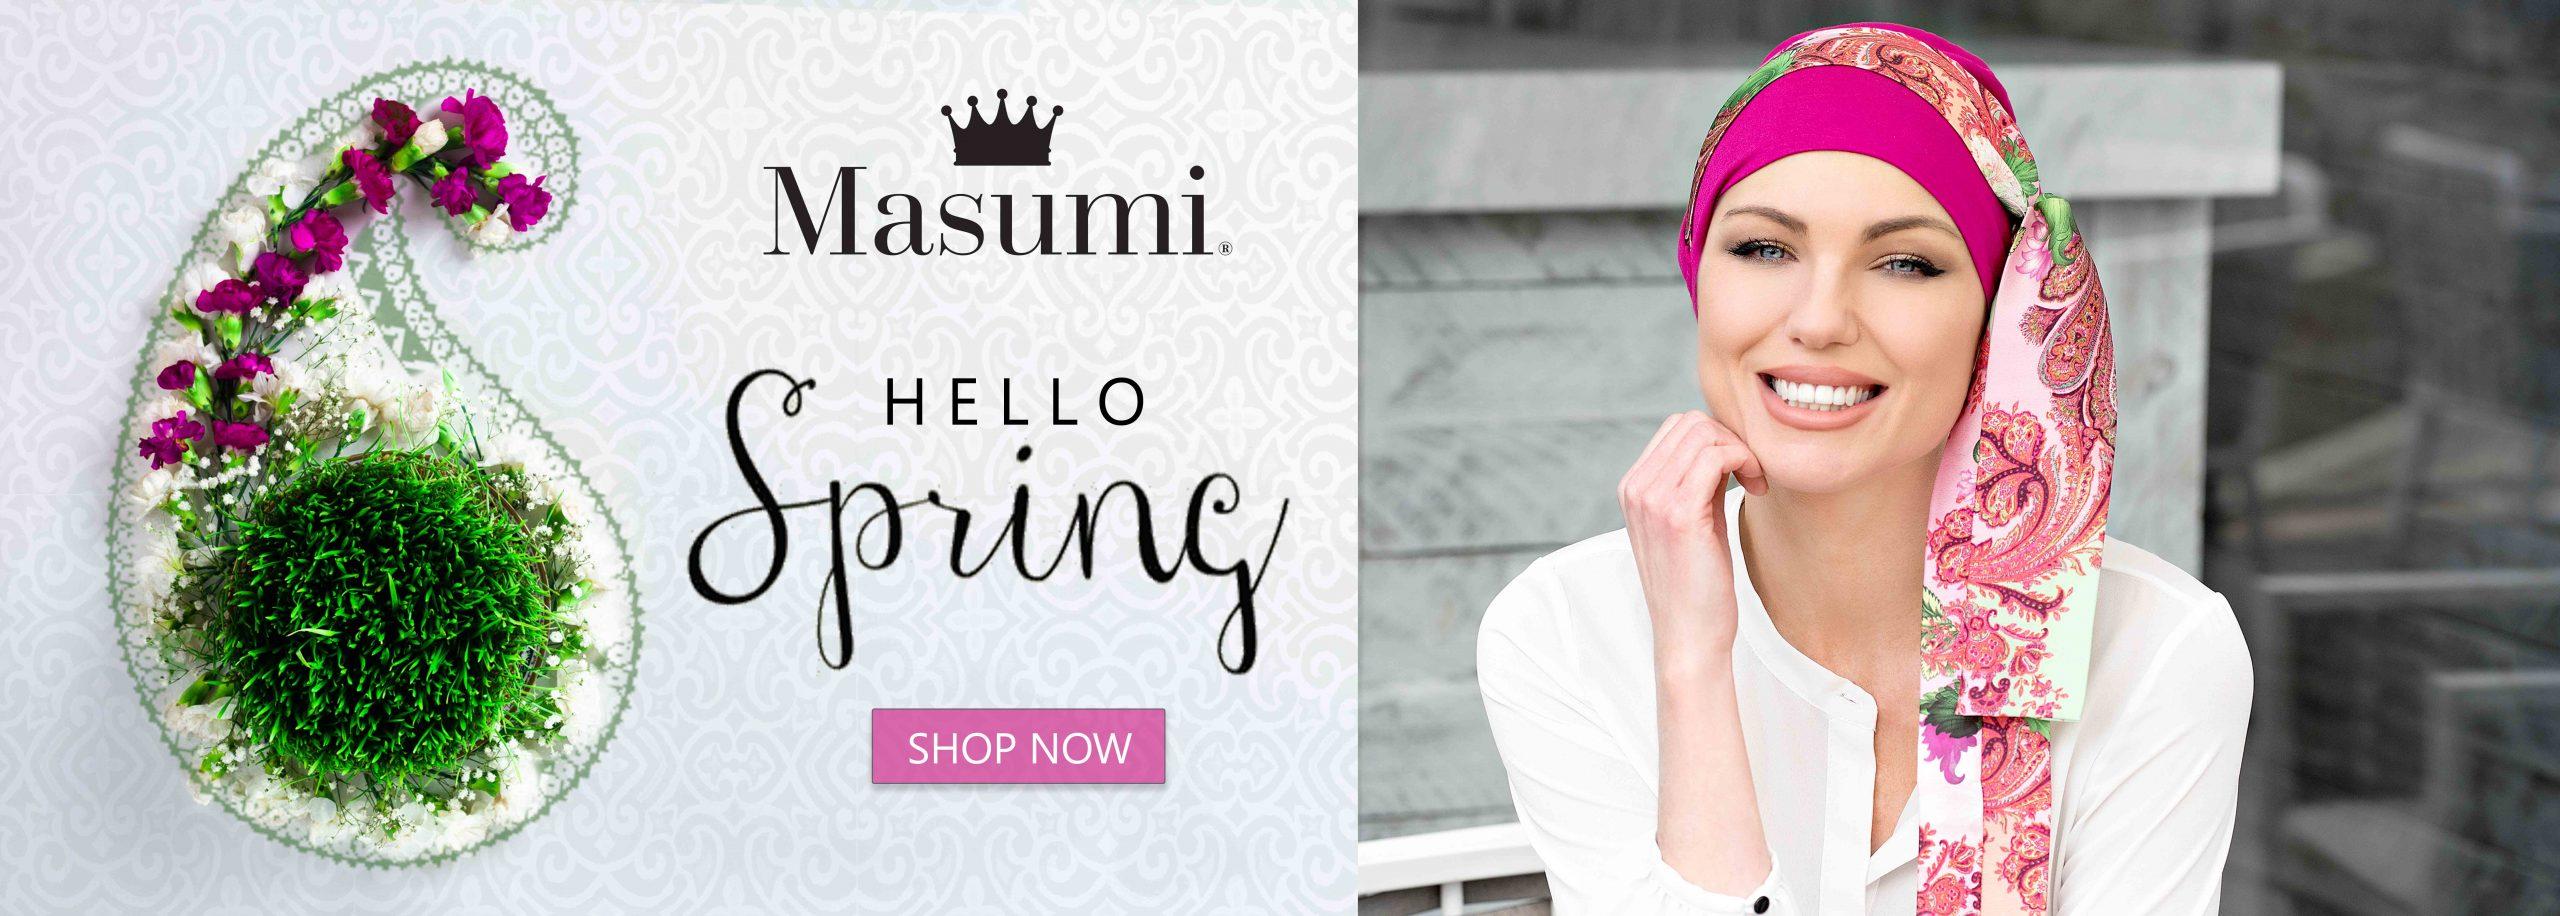 Masumi Headwear Spring 2021 banner